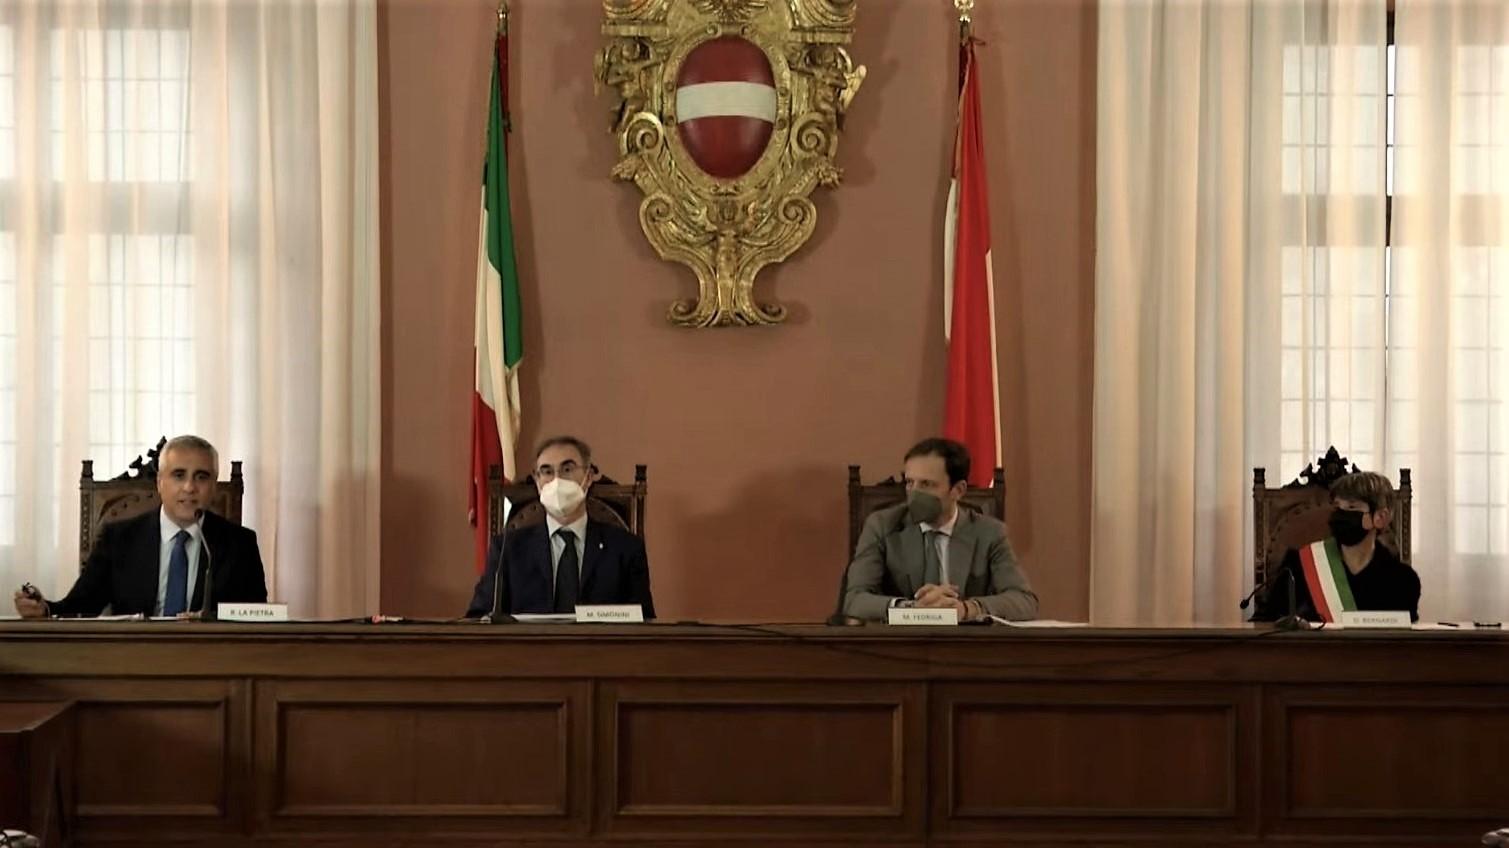 Apertura al traffico variante di Cividale del Friuli - Massimo Simonini, Massimiliano Fedriga, Daniela Bernardi